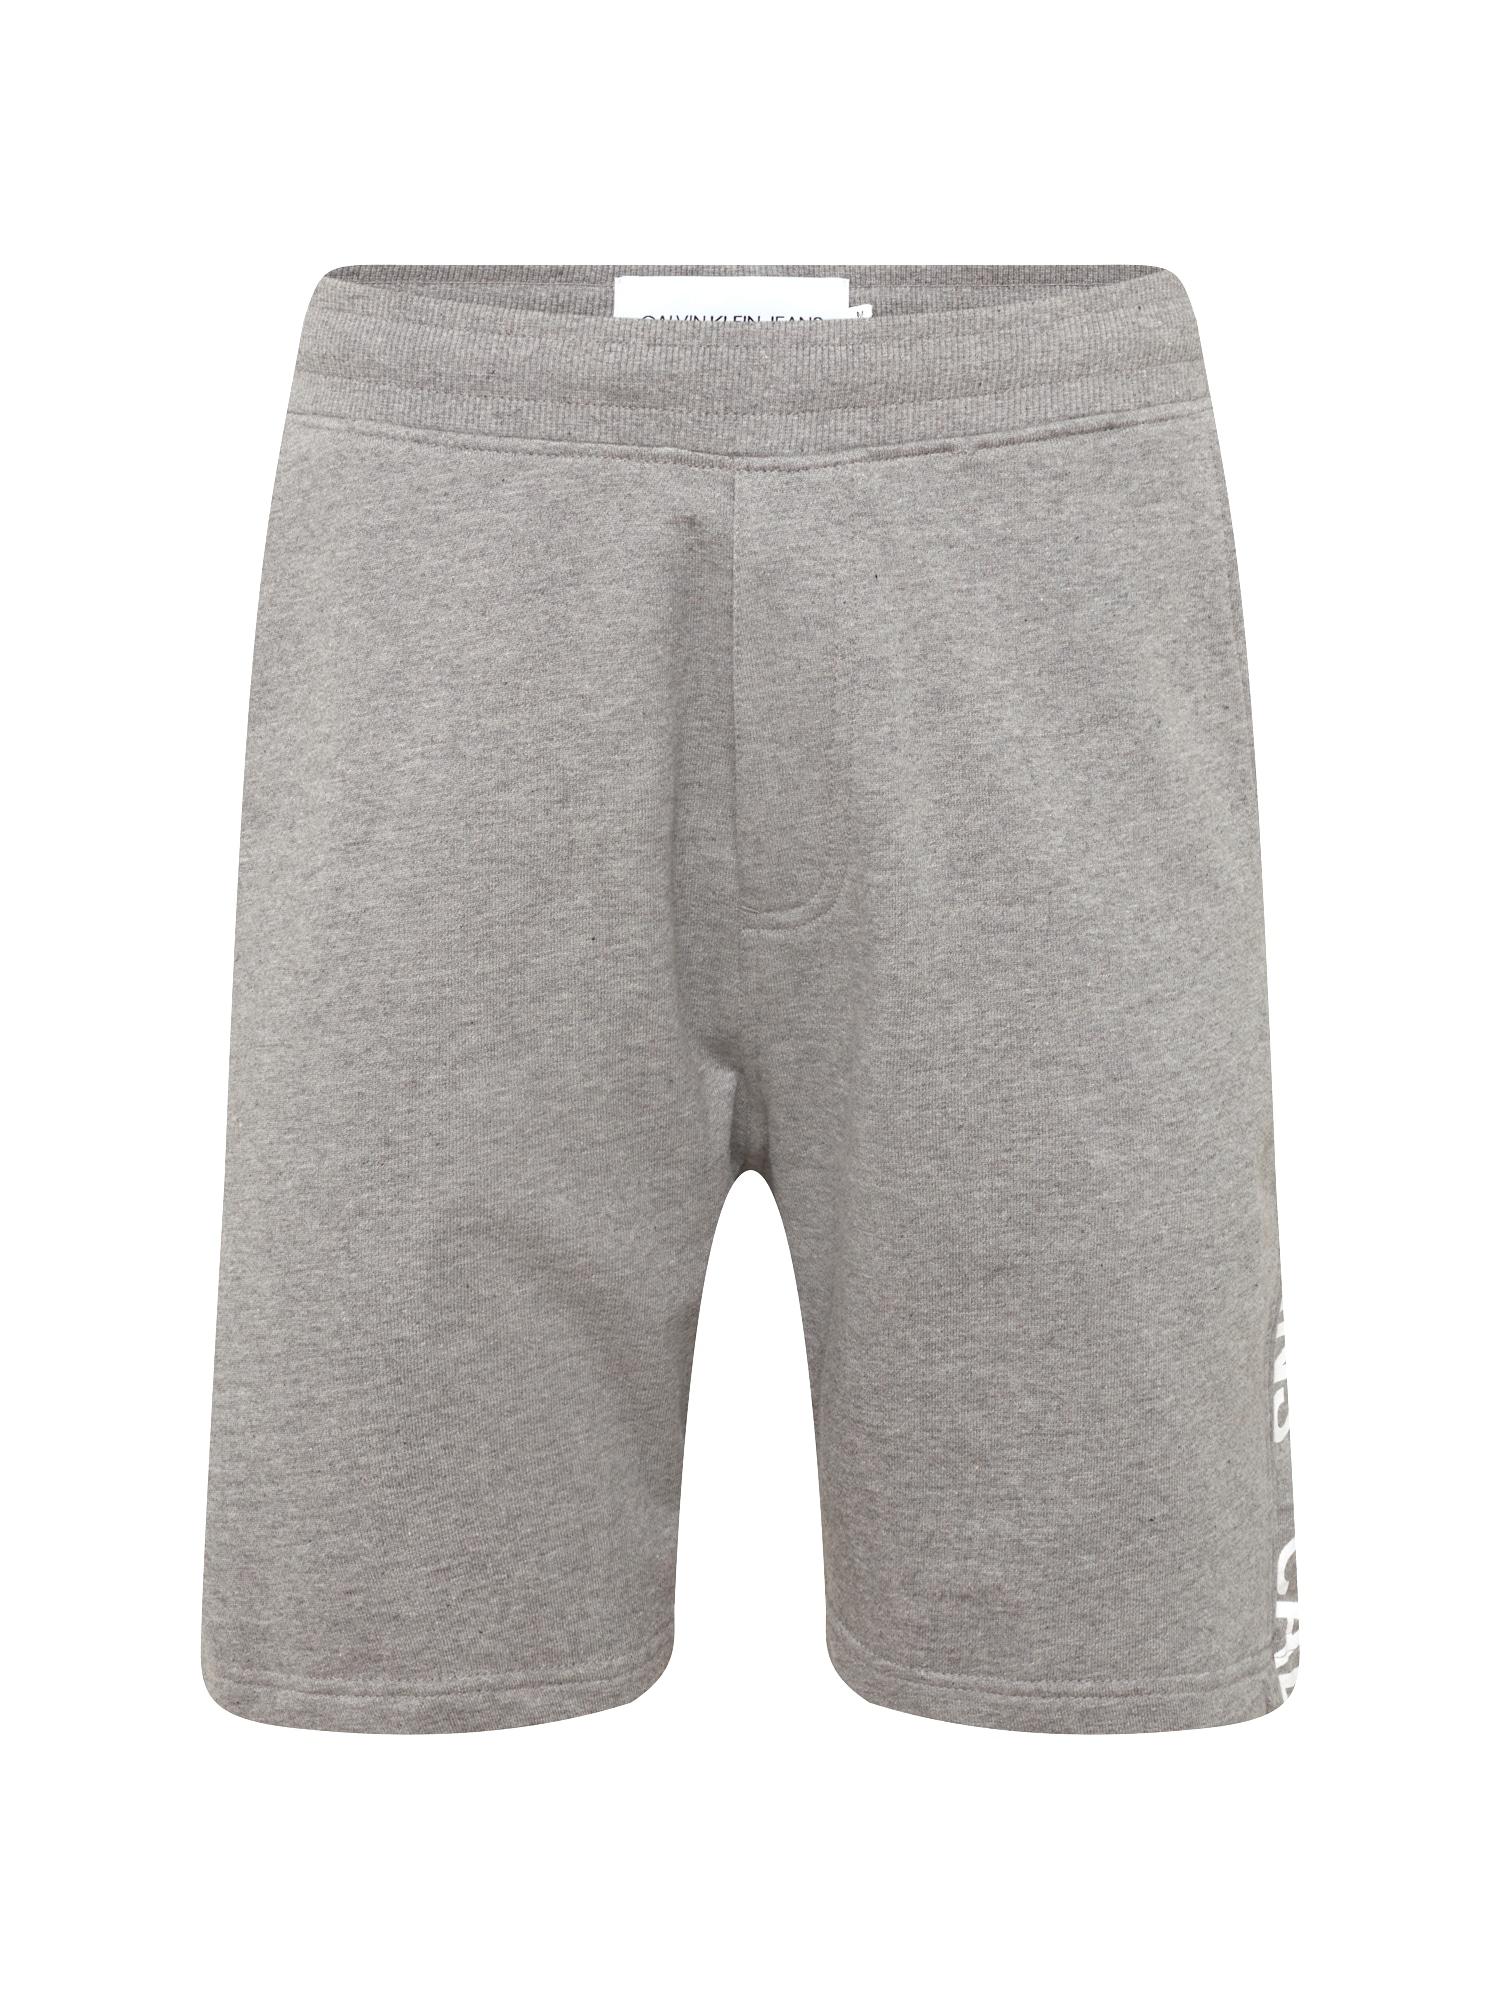 Kalhoty SIDE INSTITUTIONAL SHORT šedý melír Calvin Klein Jeans